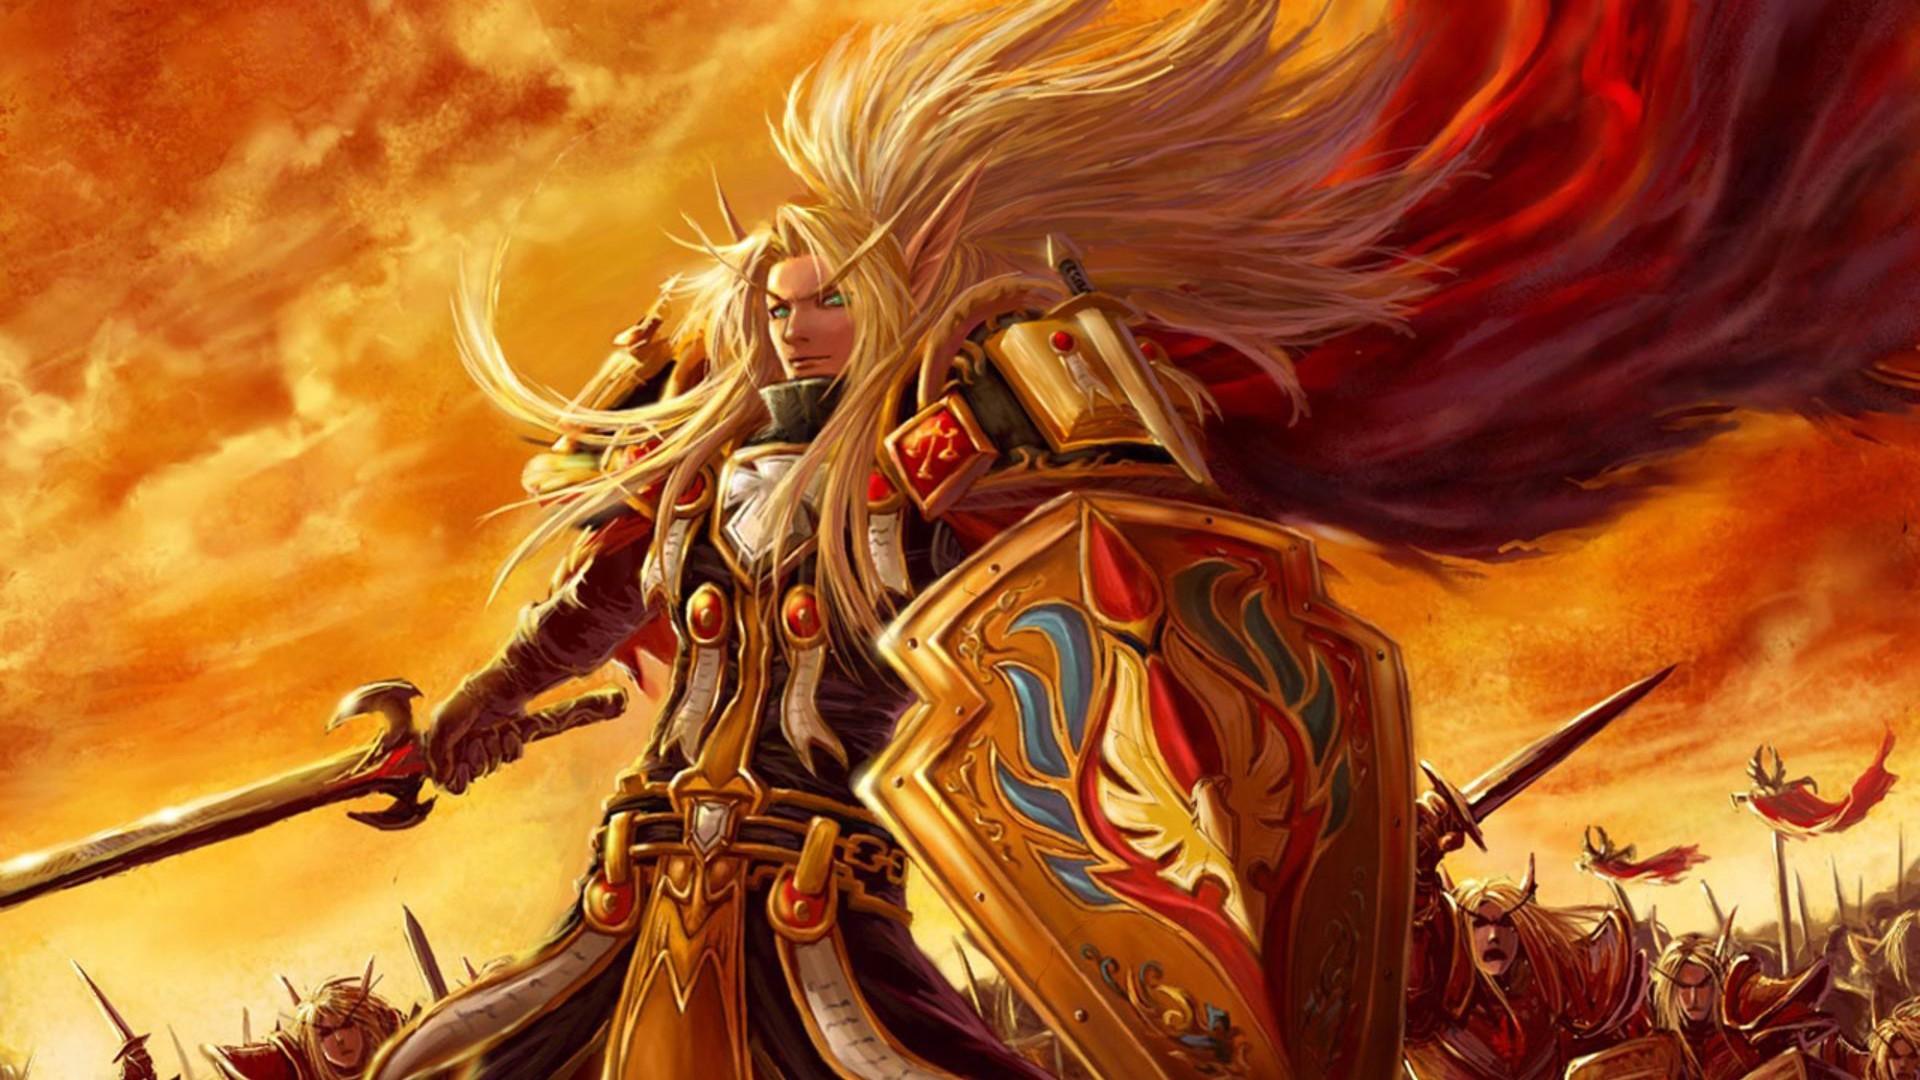 World Of Warcraft Wallpapers Desktop Sdeerwallpaper | HD Wallpapers |  Pinterest | Wallpaper, Wallpaper desktop and deviantART